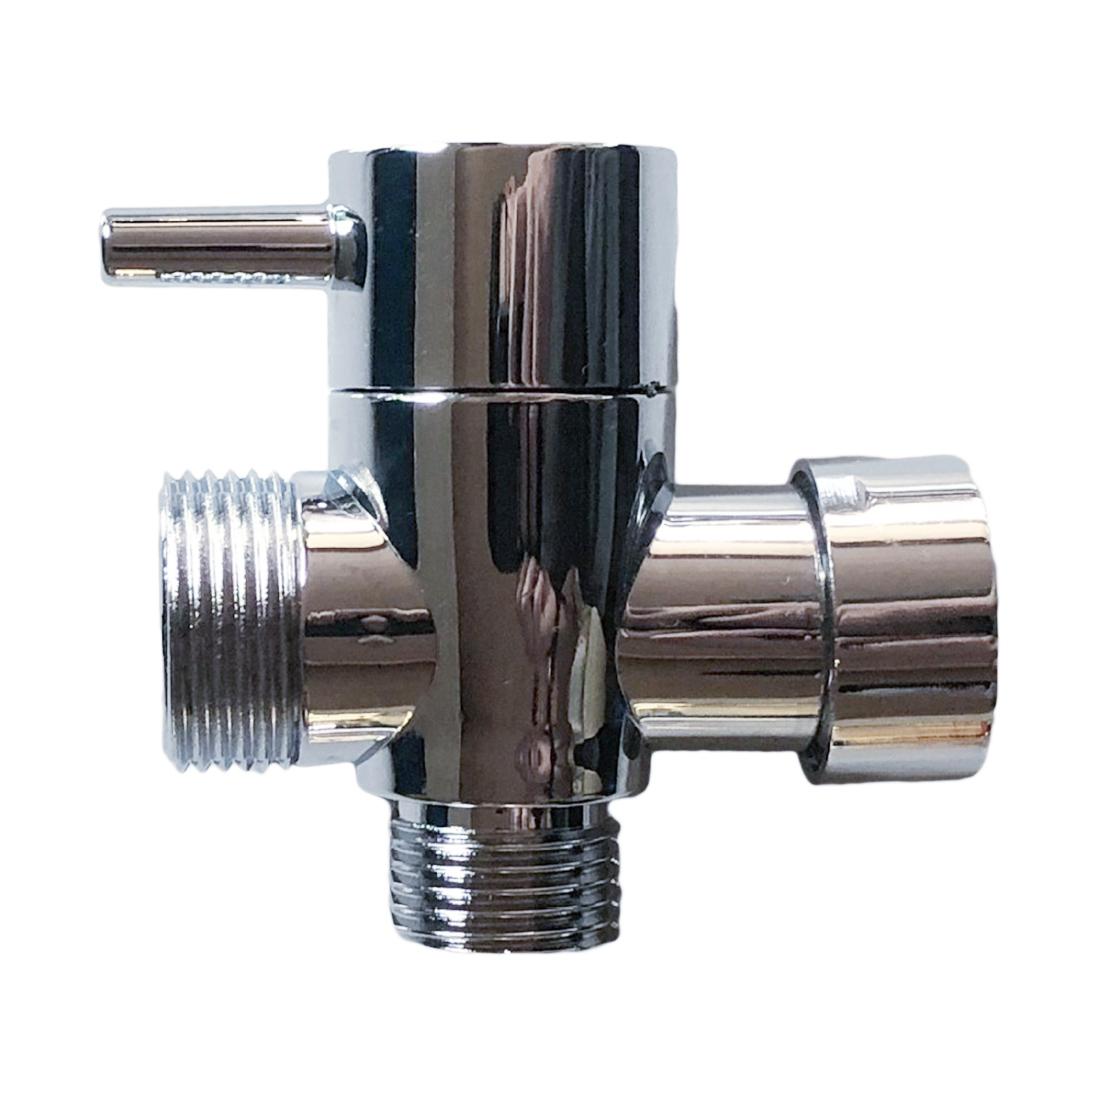 Crisol de grafito mini horno de oro de la antorcha de fusión del metal  1  grifo de baño accesorios 1 x anillo de sellado 30cc1faf91a1